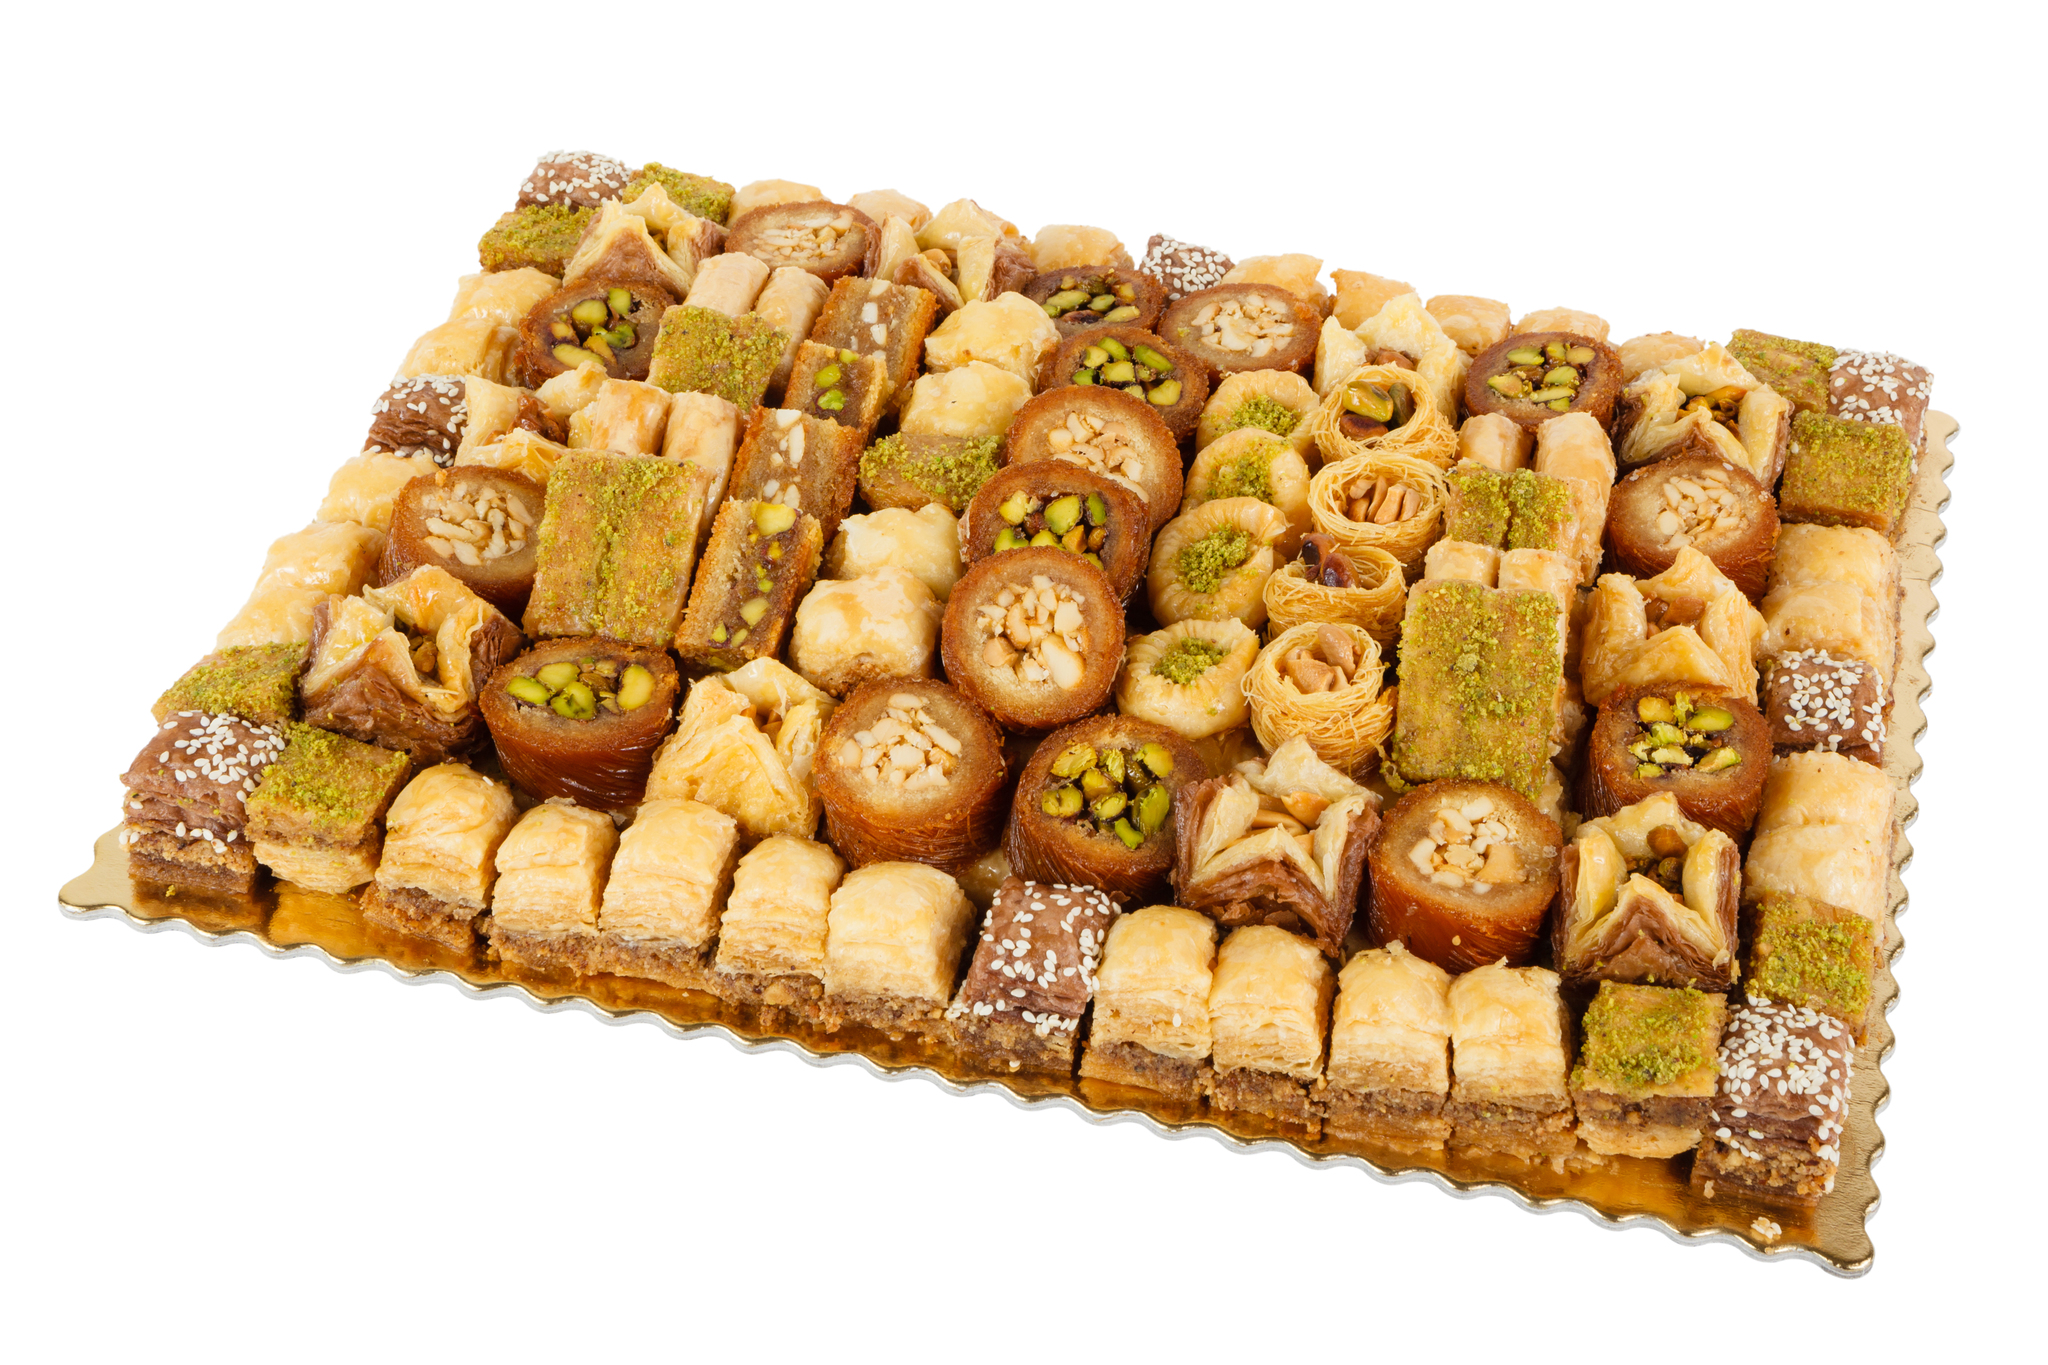 "Ассорти Пахлава - ассорти ливанских сладостей ""Королевское"", 5000 г import_files_7e_7e6d0b69787e11e799f3606c664b1de1_226777eeae6c11e7b011fcaa1488e48f.jpg"